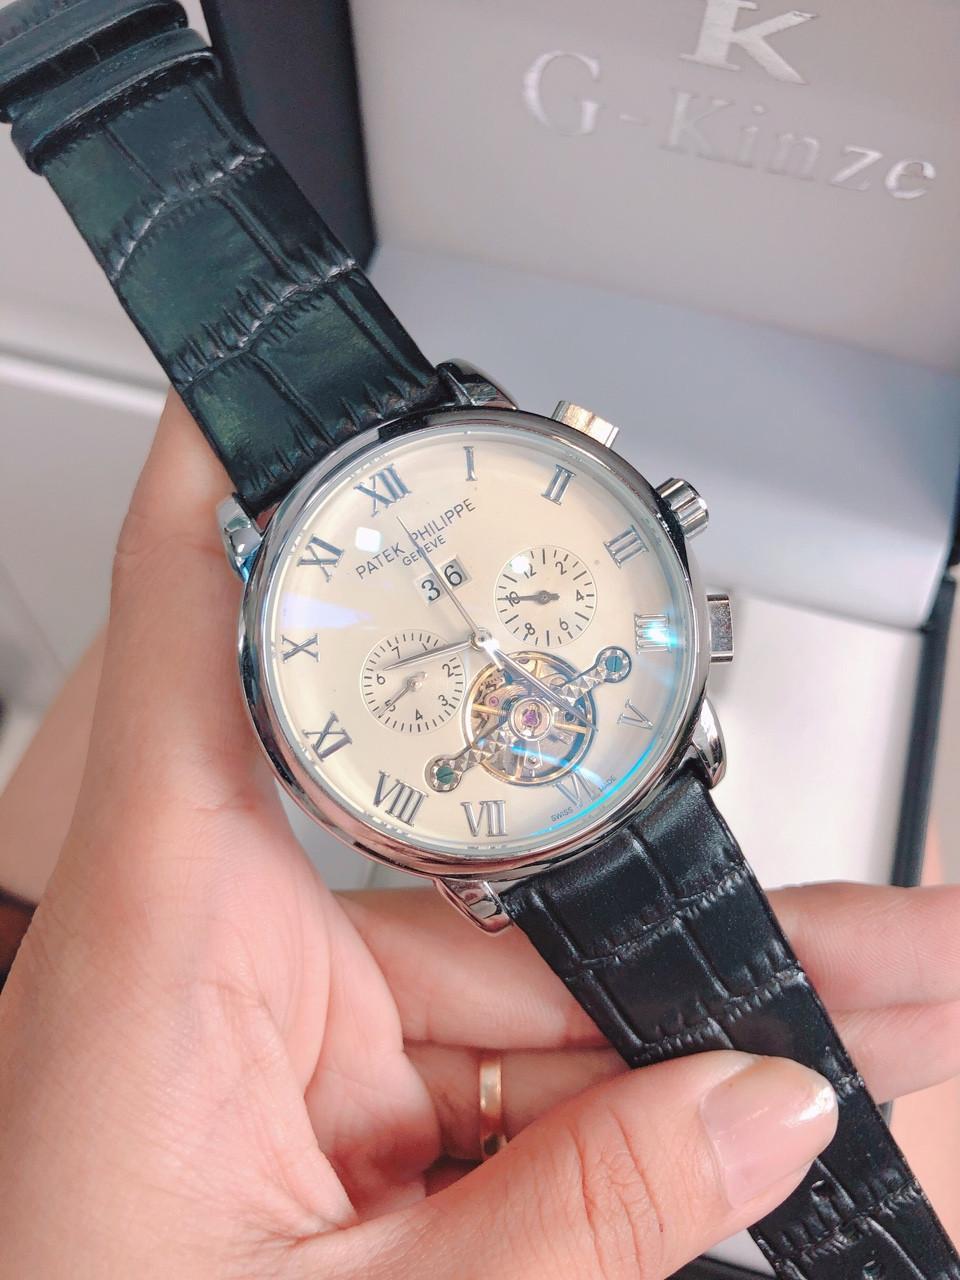 Đồng hồ nam automatic patek philippe montblanc dây da tốt bán chạy